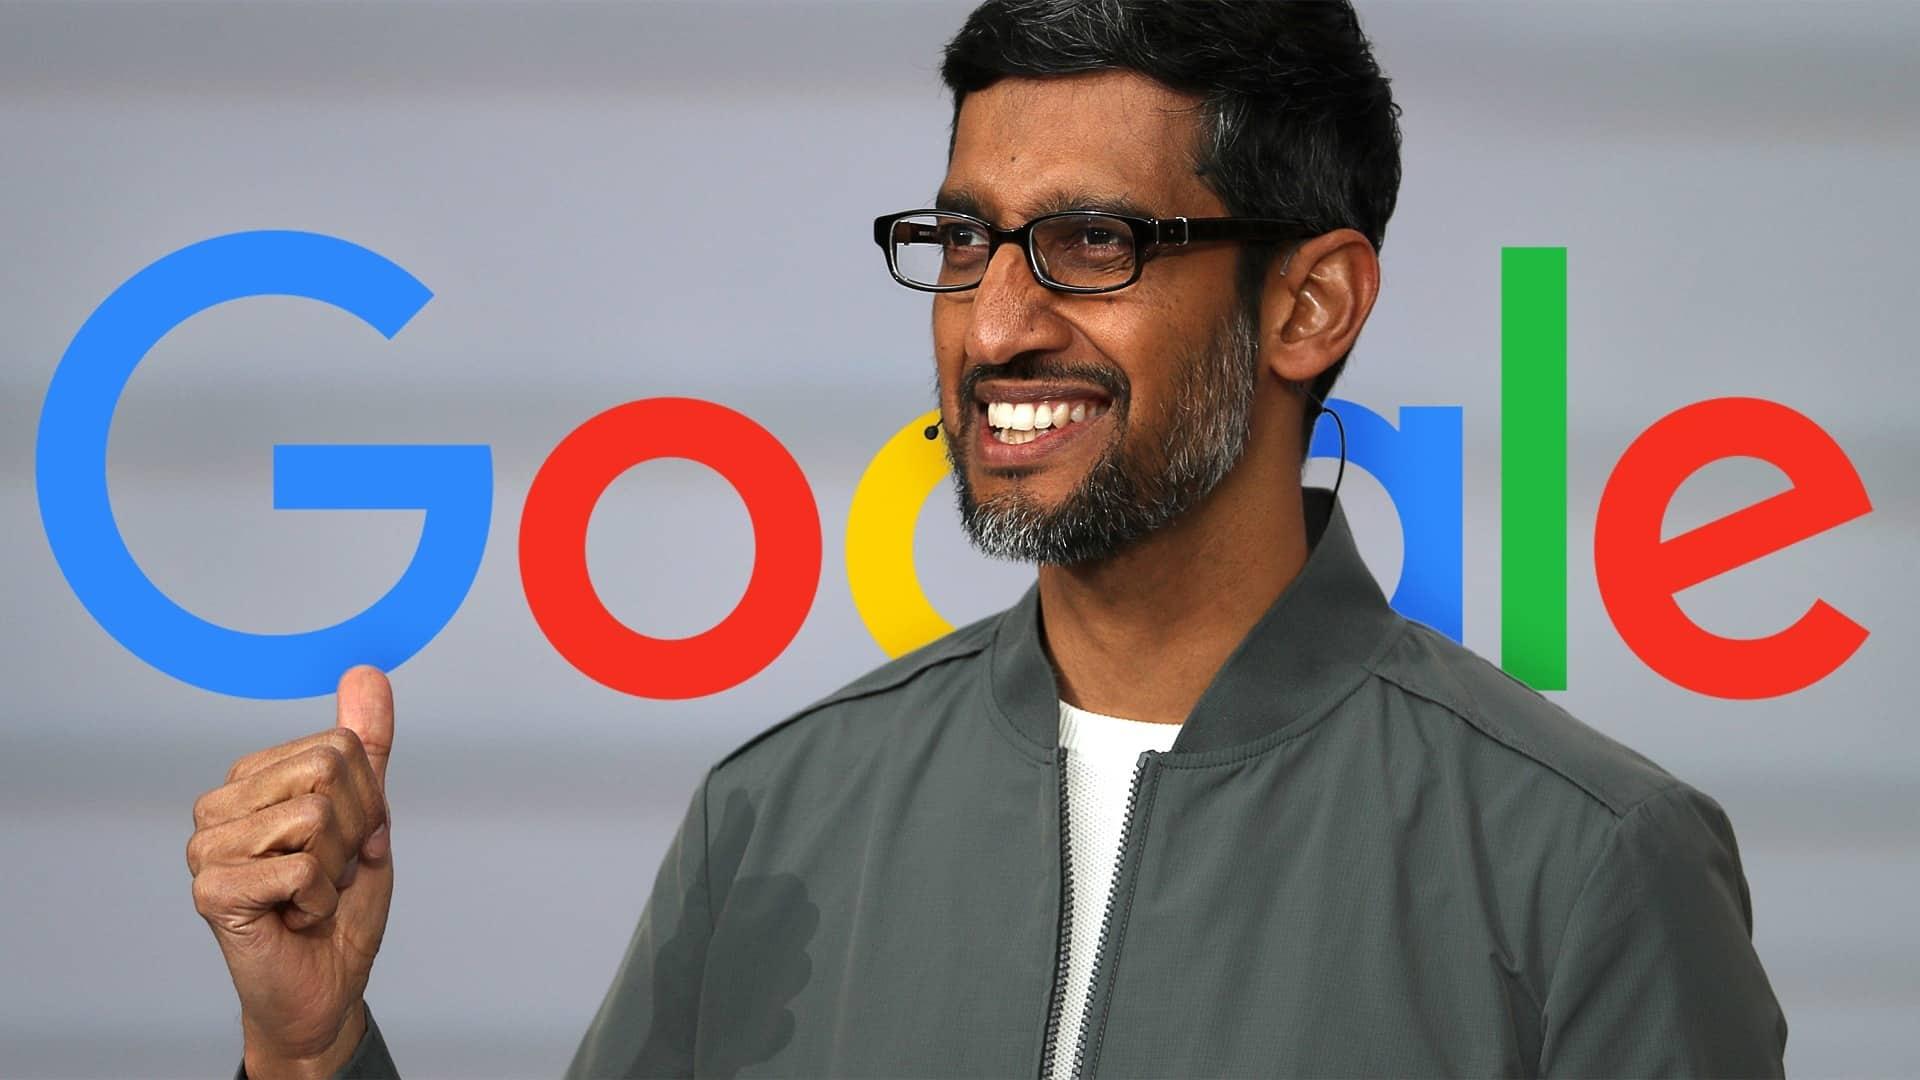 umela inteligencia sef google